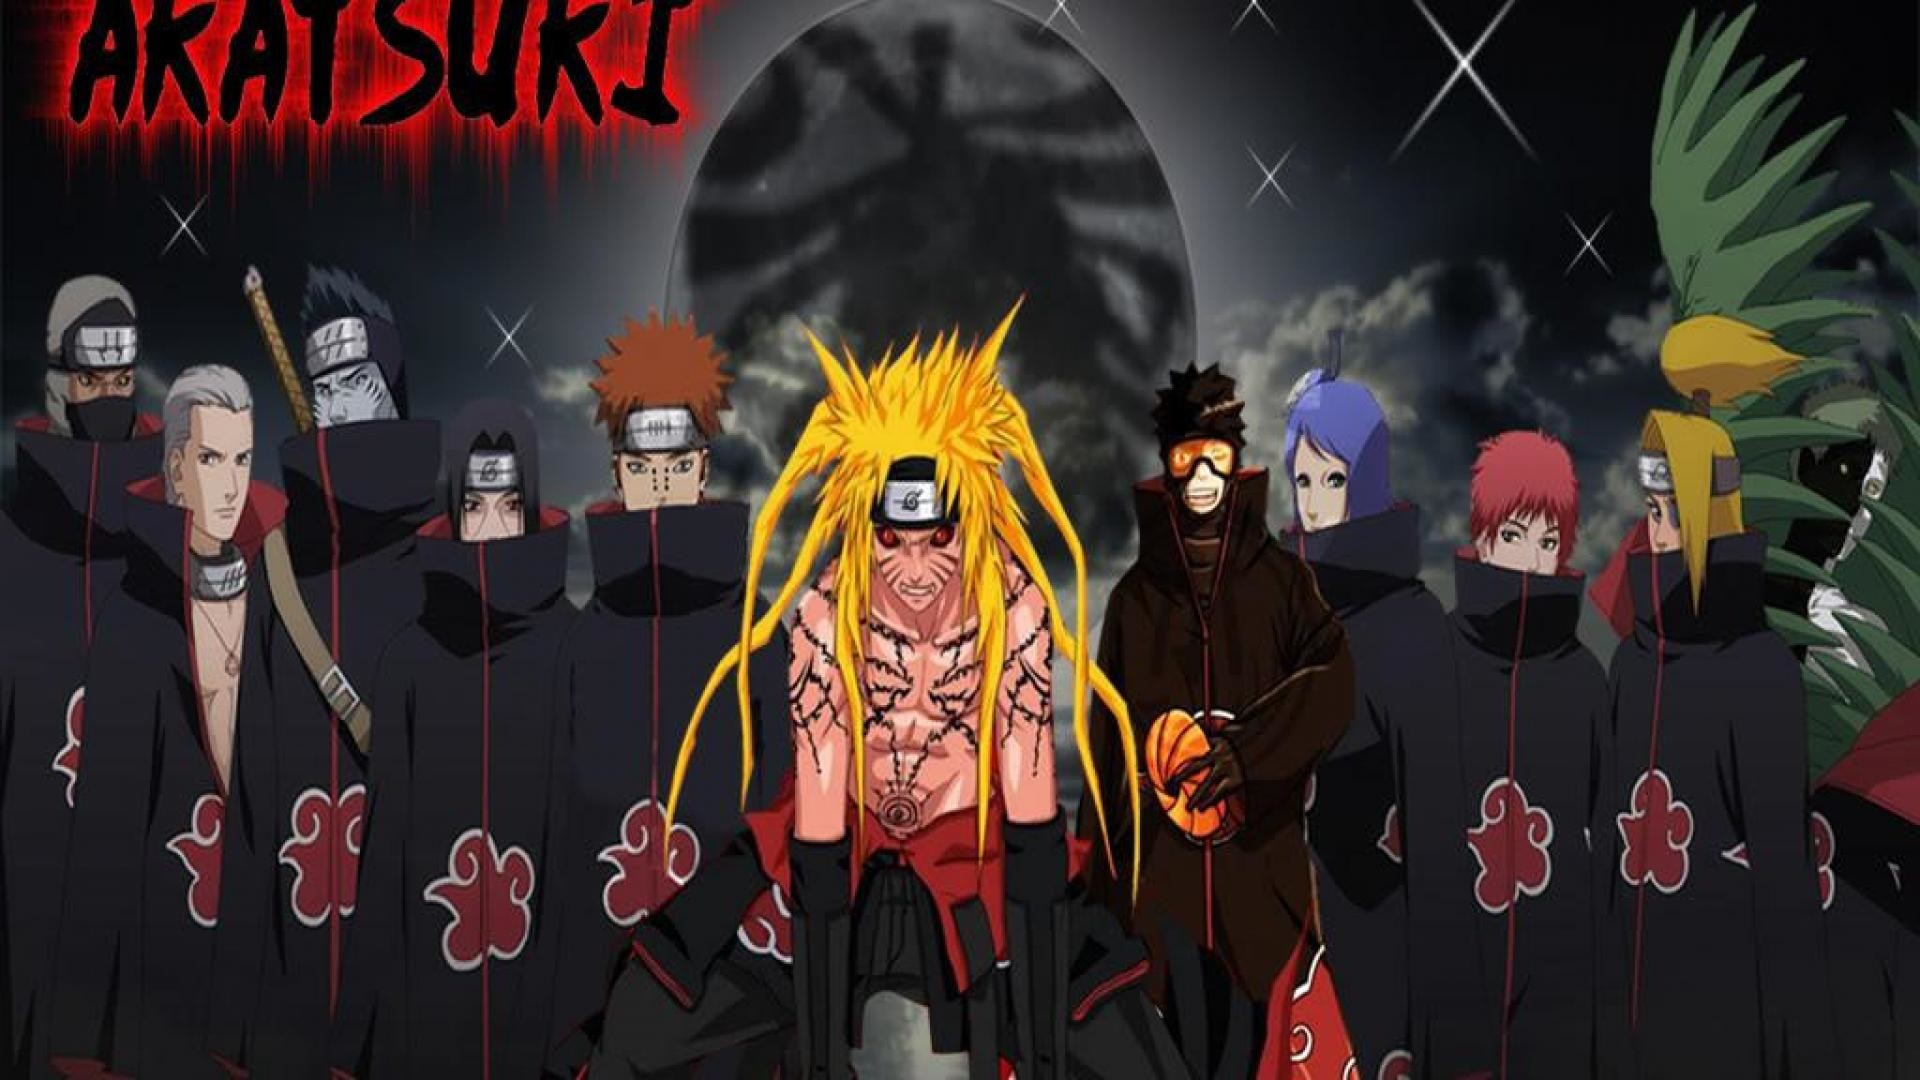 Download Wallpaper Naruto Akatsuki - 968903-download-free-naruto-shippuden-wallpaper-akatsuki-1920x1080-ipad-pro  Pictures_391613.jpg